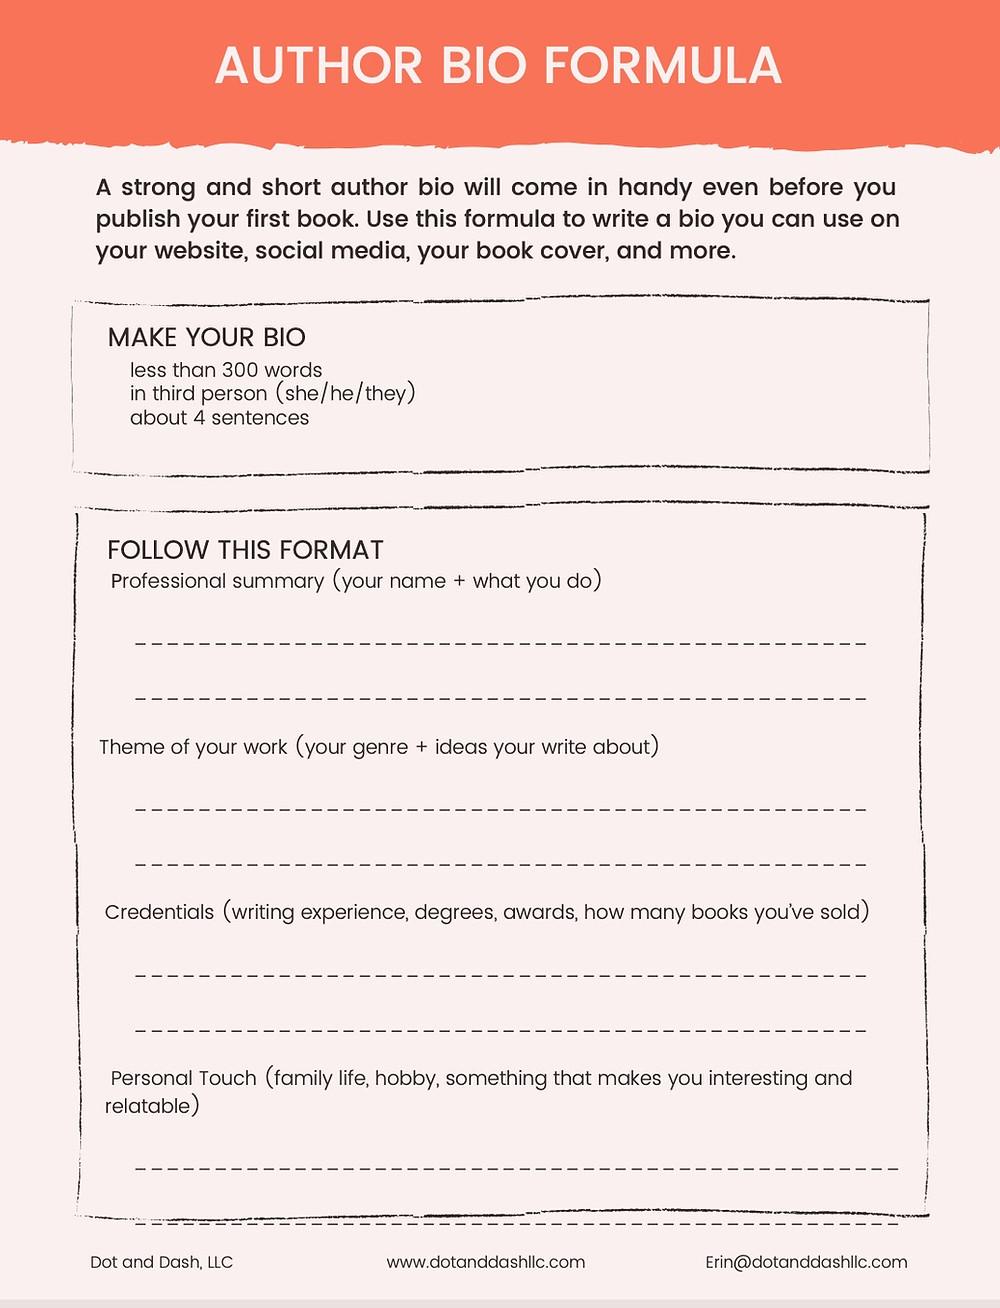 an image of the author bio formula worksheet